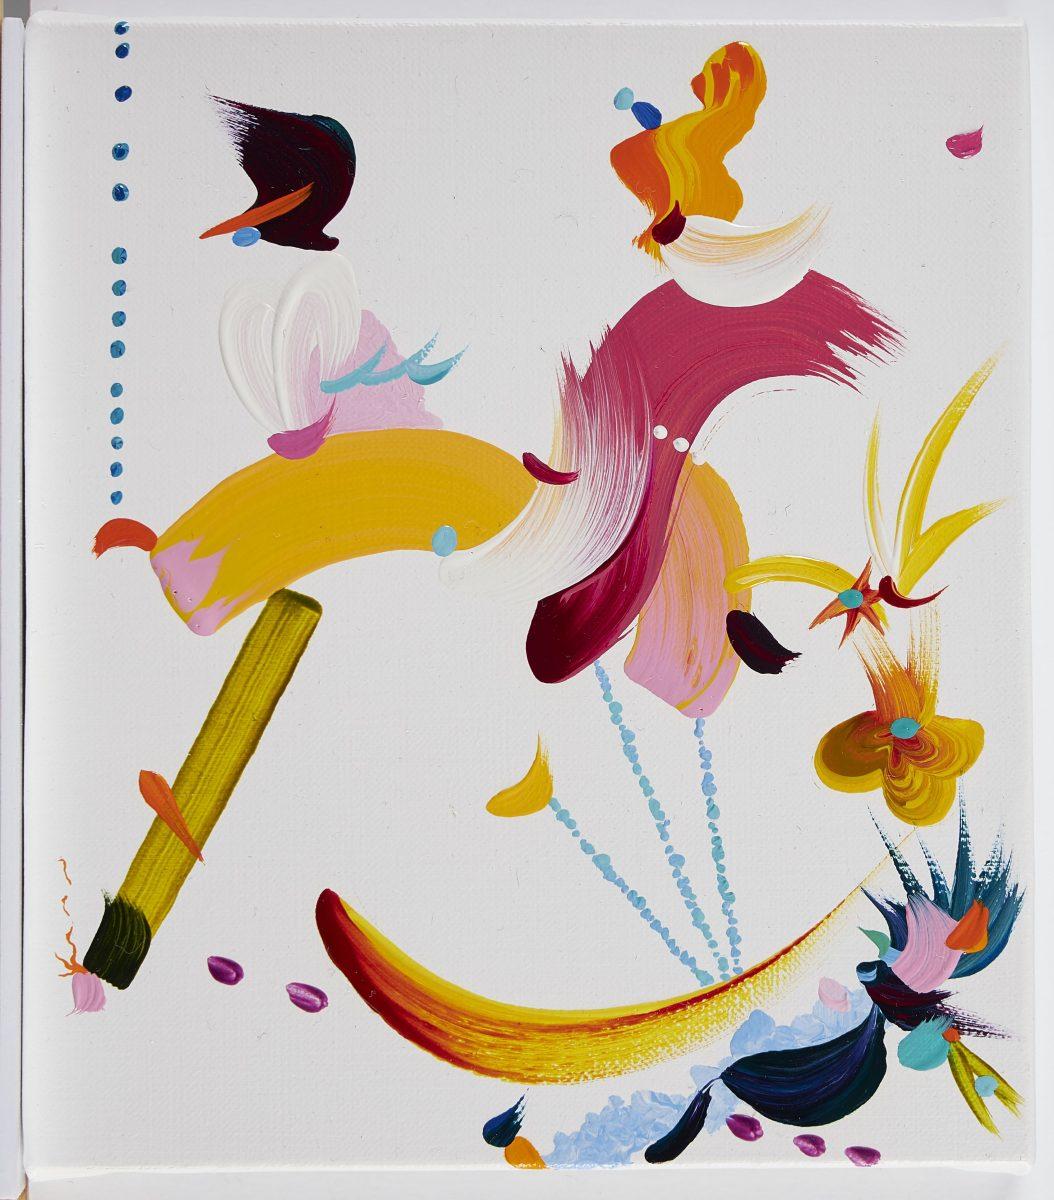 Fiona Rae, Abstract 01, 2020. © Fiona Rae